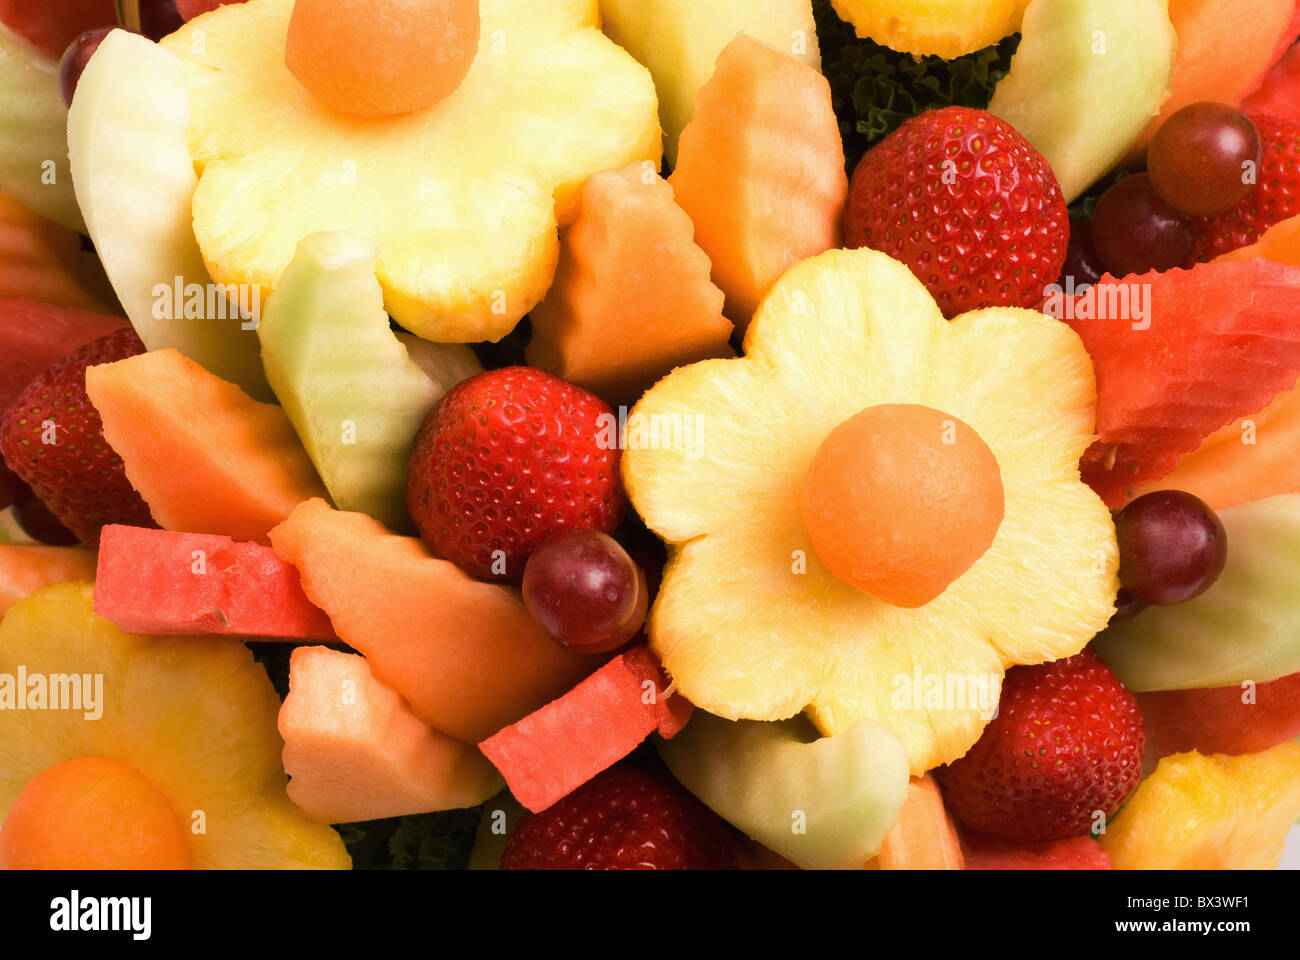 Basket Made Of Fruit - Stock Image